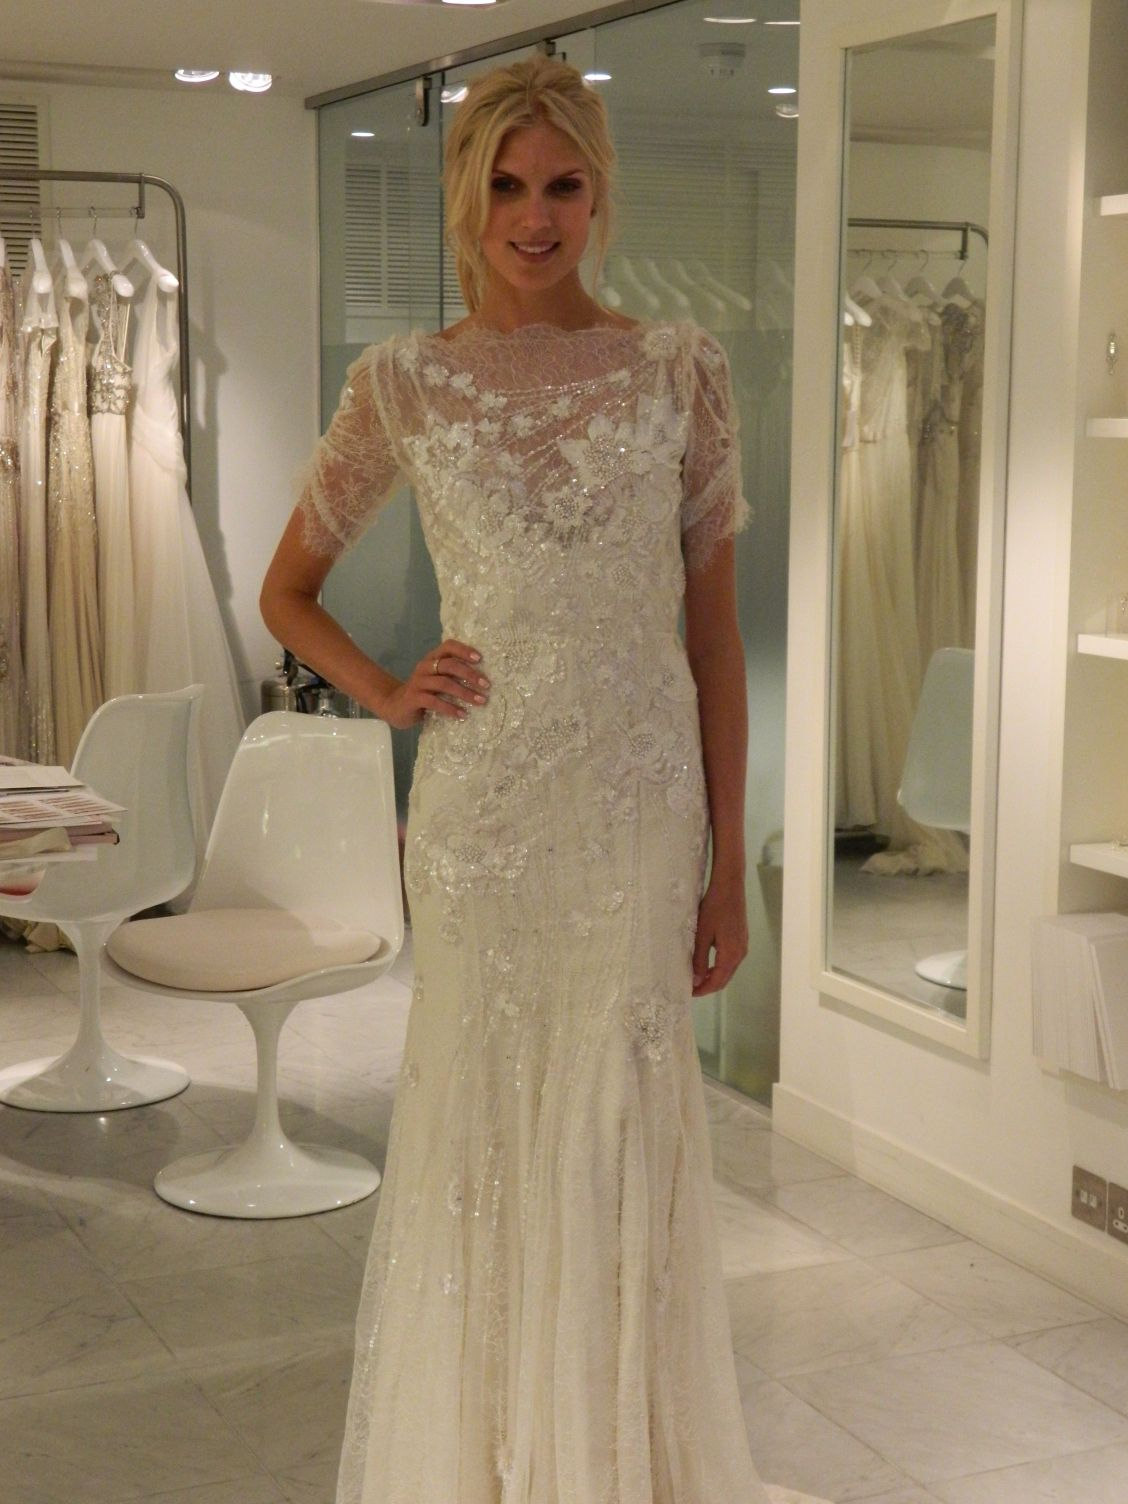 Jenny Packham Wedding Dress Prices - Best Wedding Dress for Pear ...